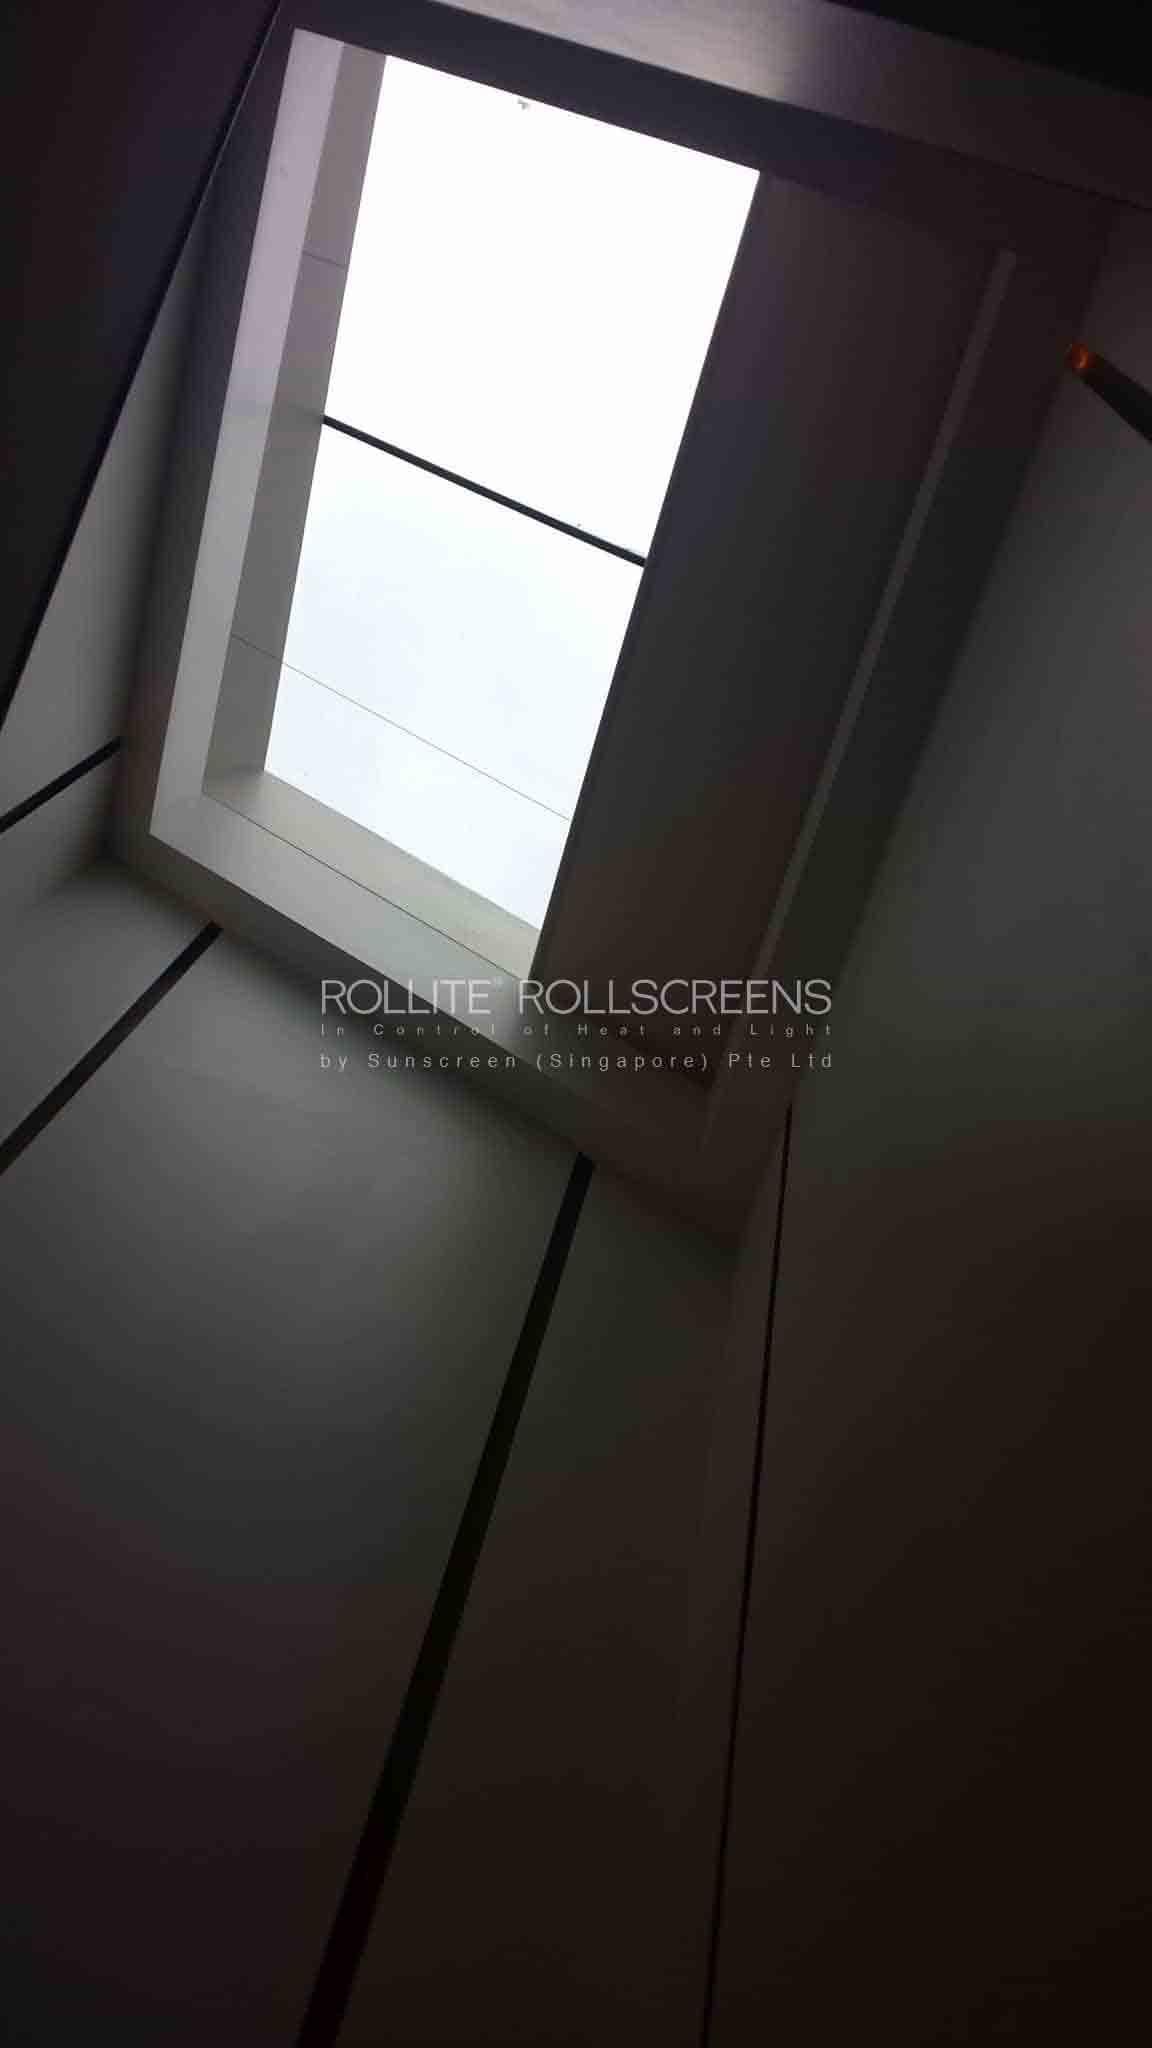 Sunscreen-Singapore_Rollite-Skylight-16